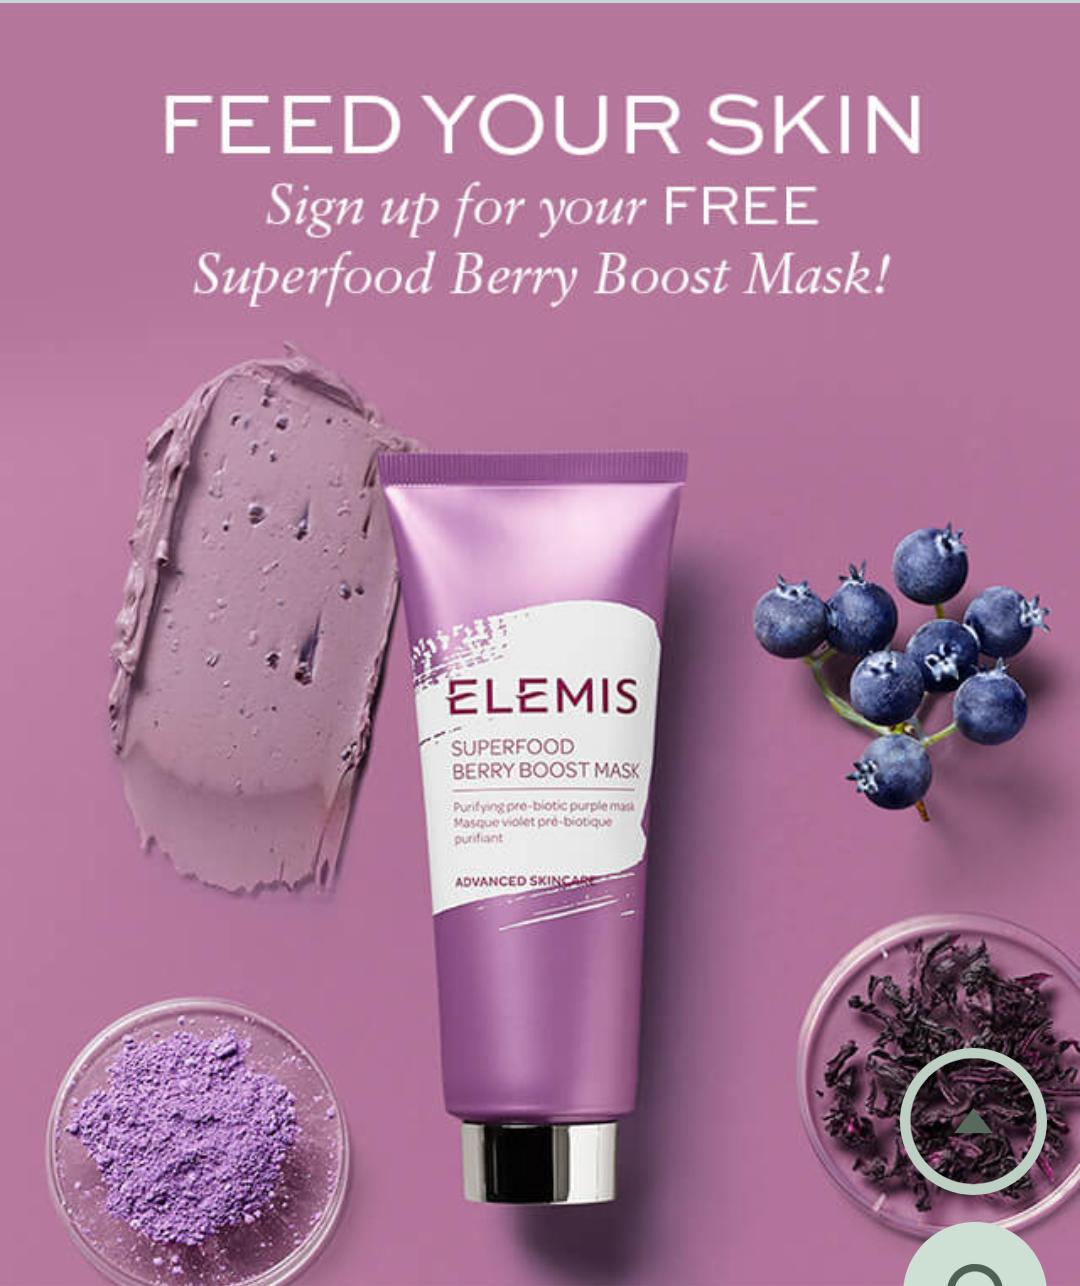 Free Elemis Berry Boost Mask 15ml